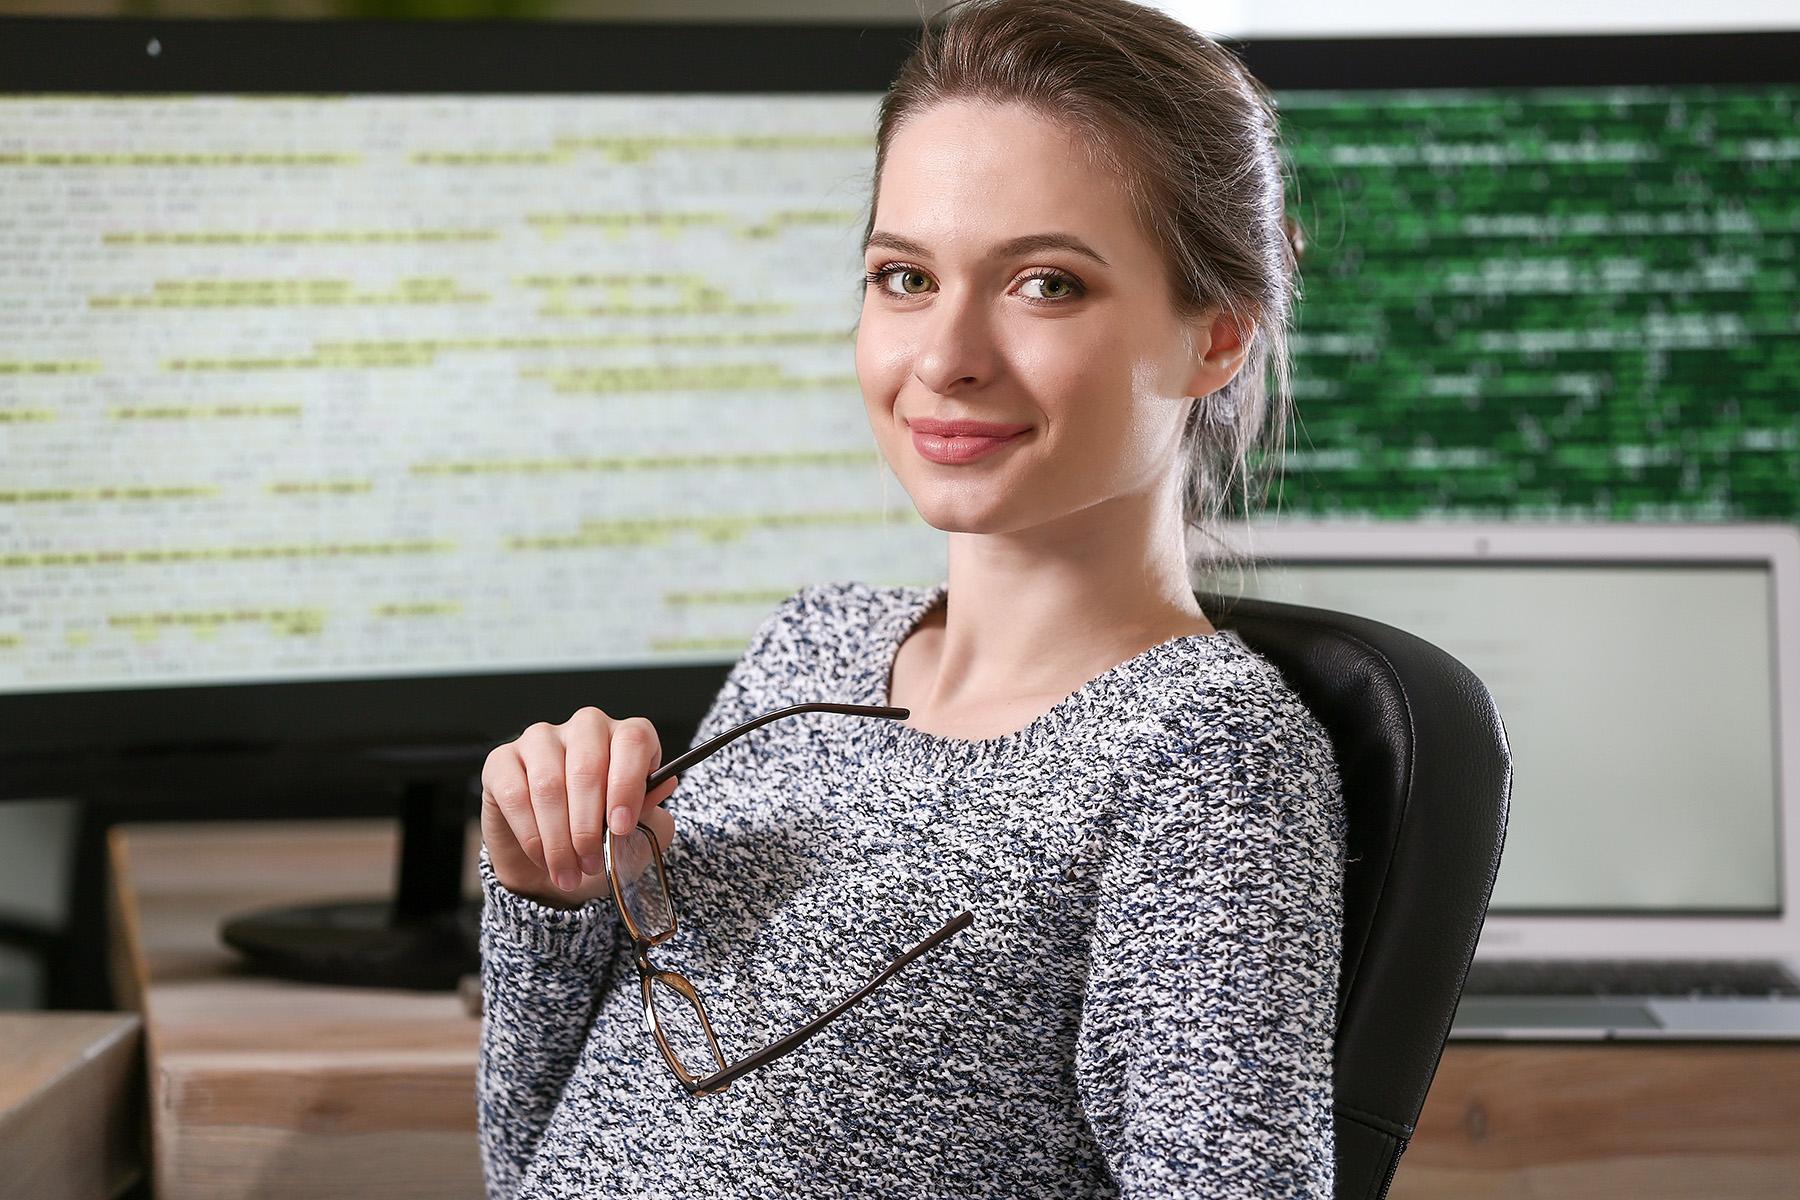 Technik programista - klasa patronacka Cisco Networking Academy